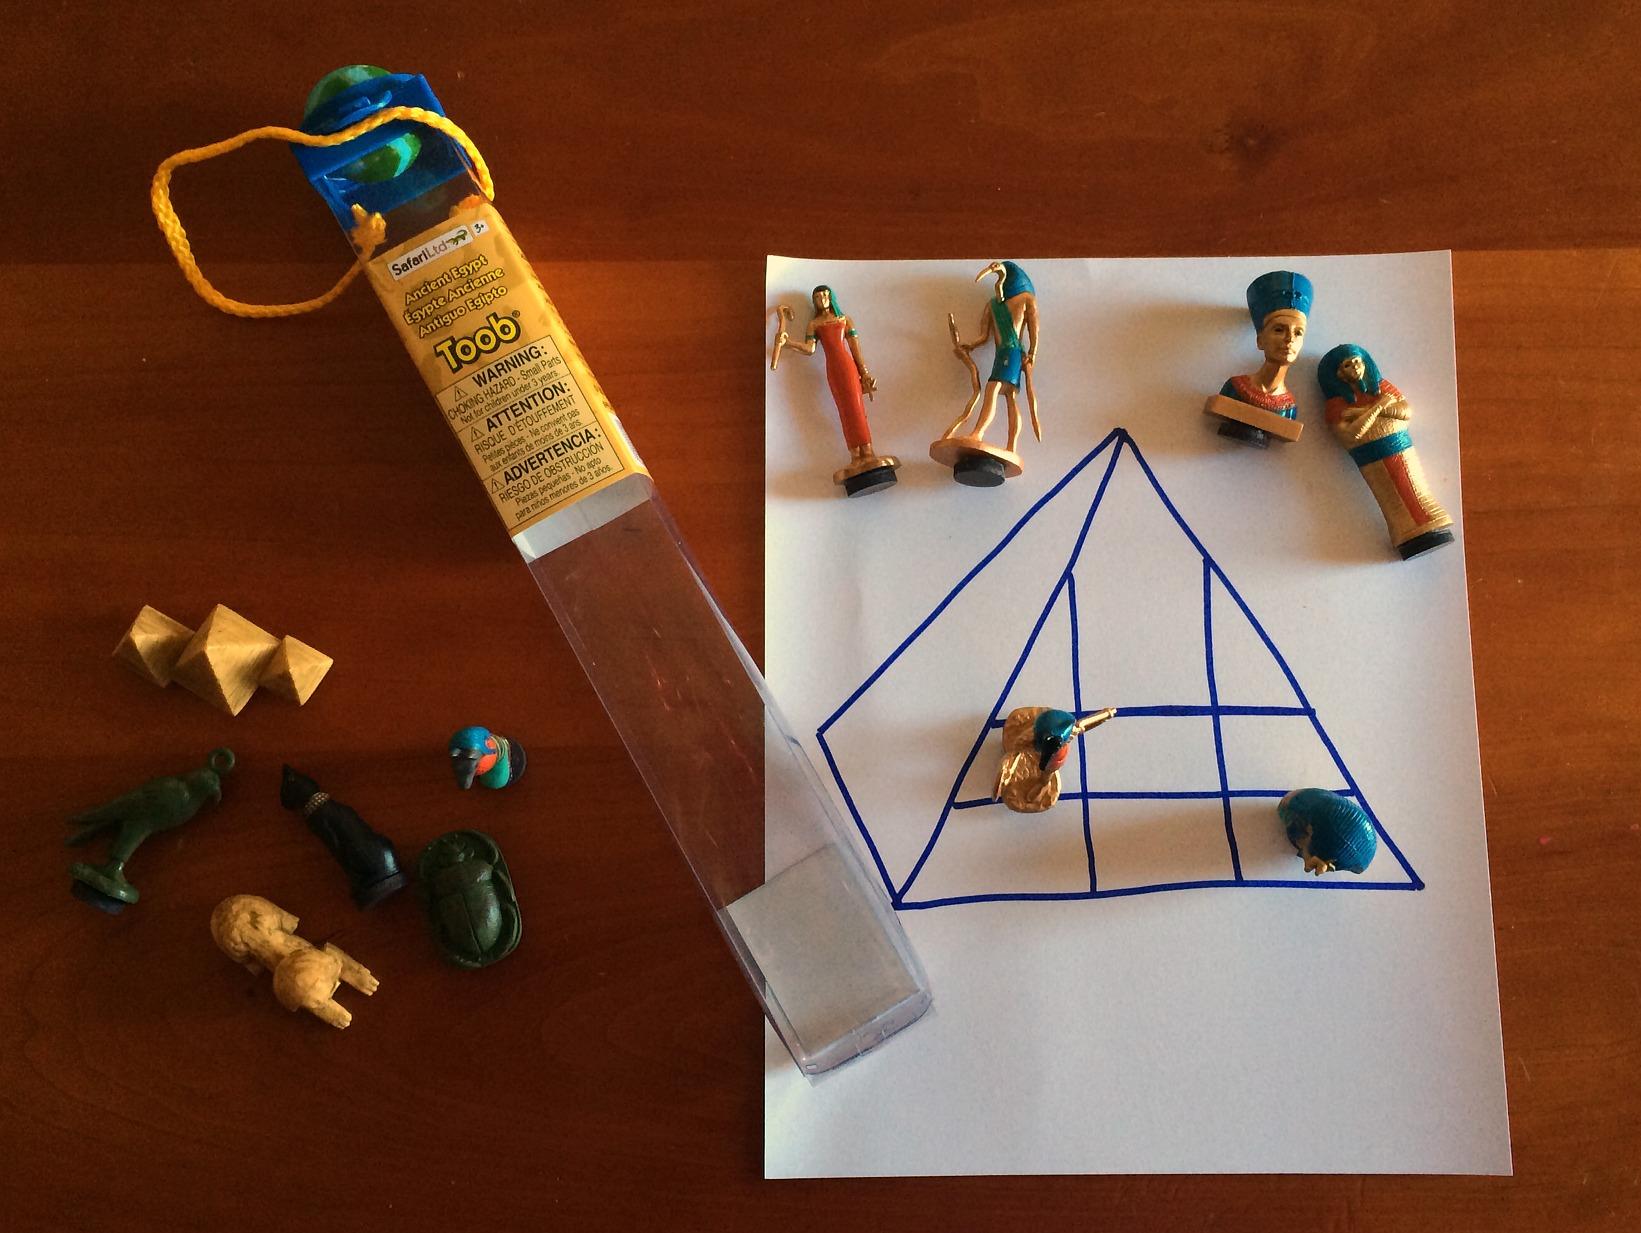 pharaoh tac toe customizable tic tac toe game toob figures